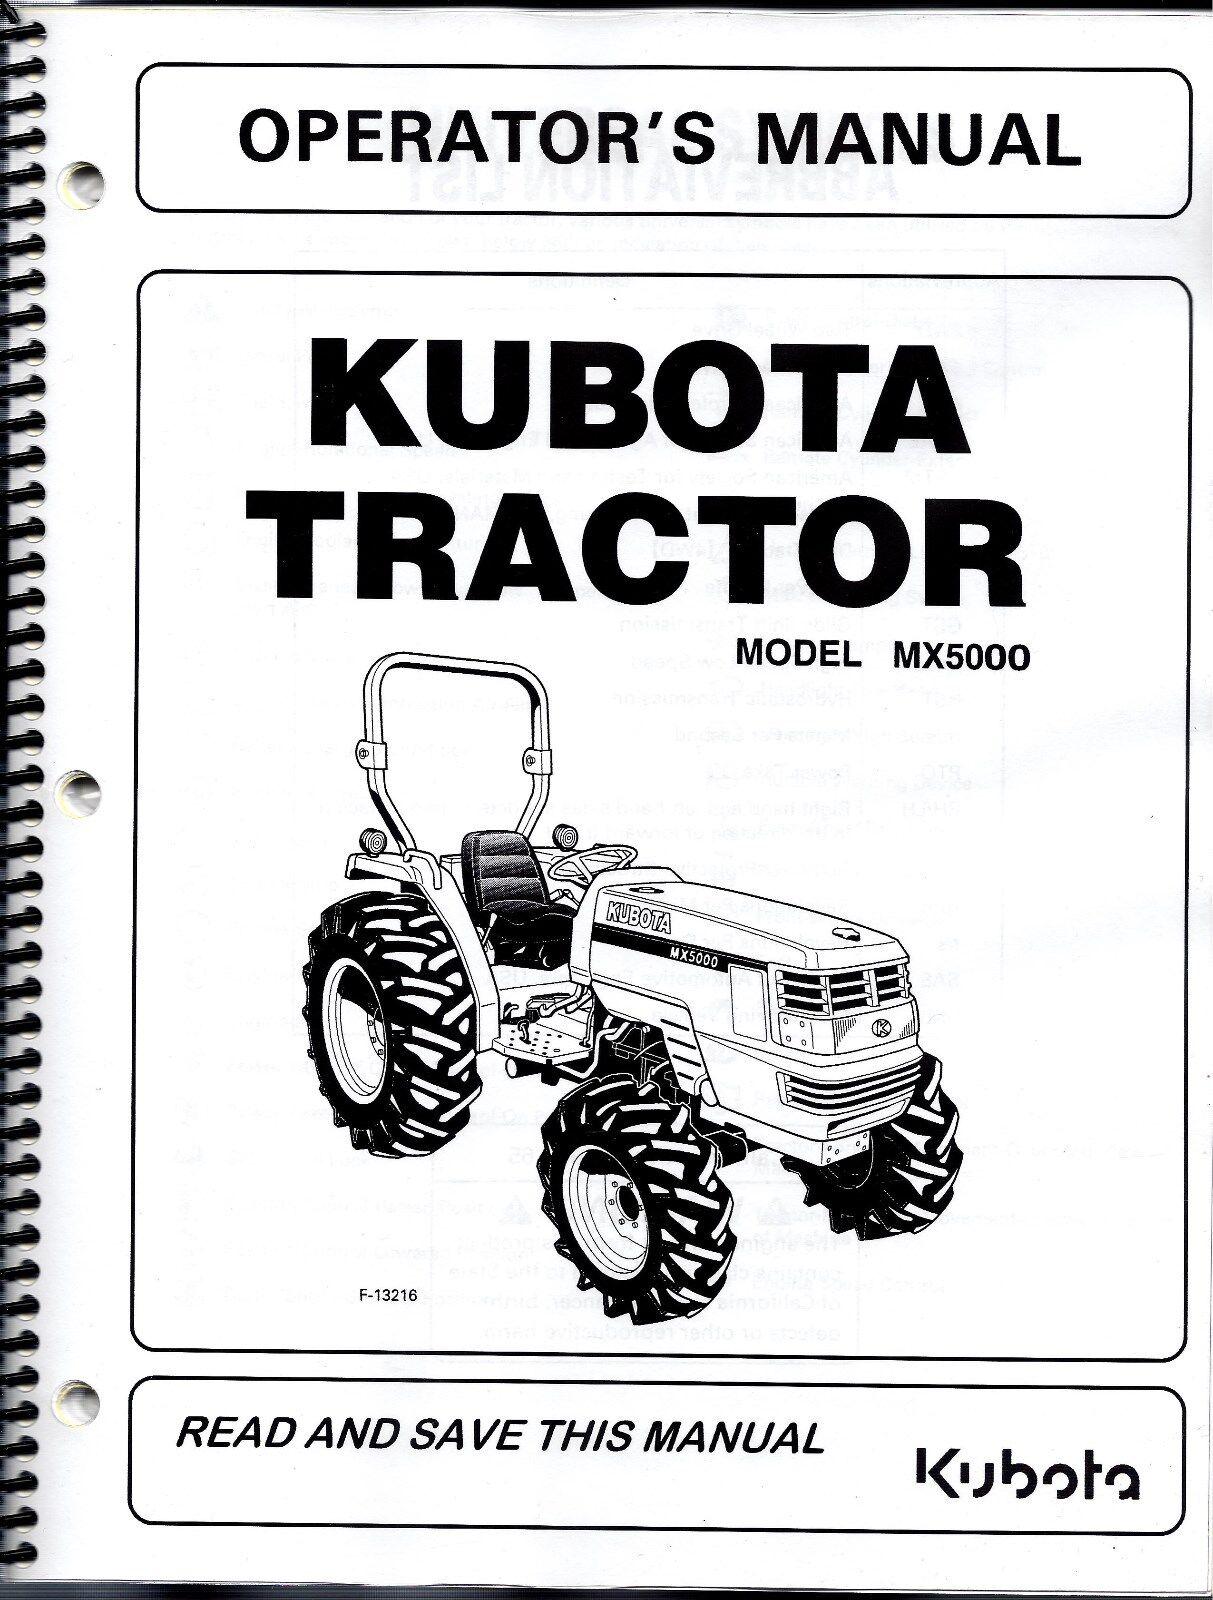 kubota mx5000 tractor plus loader operator s manuals set of 2 ebay rh ebay com service manual for kubota tractor b7800 repair manual for kubota tractor